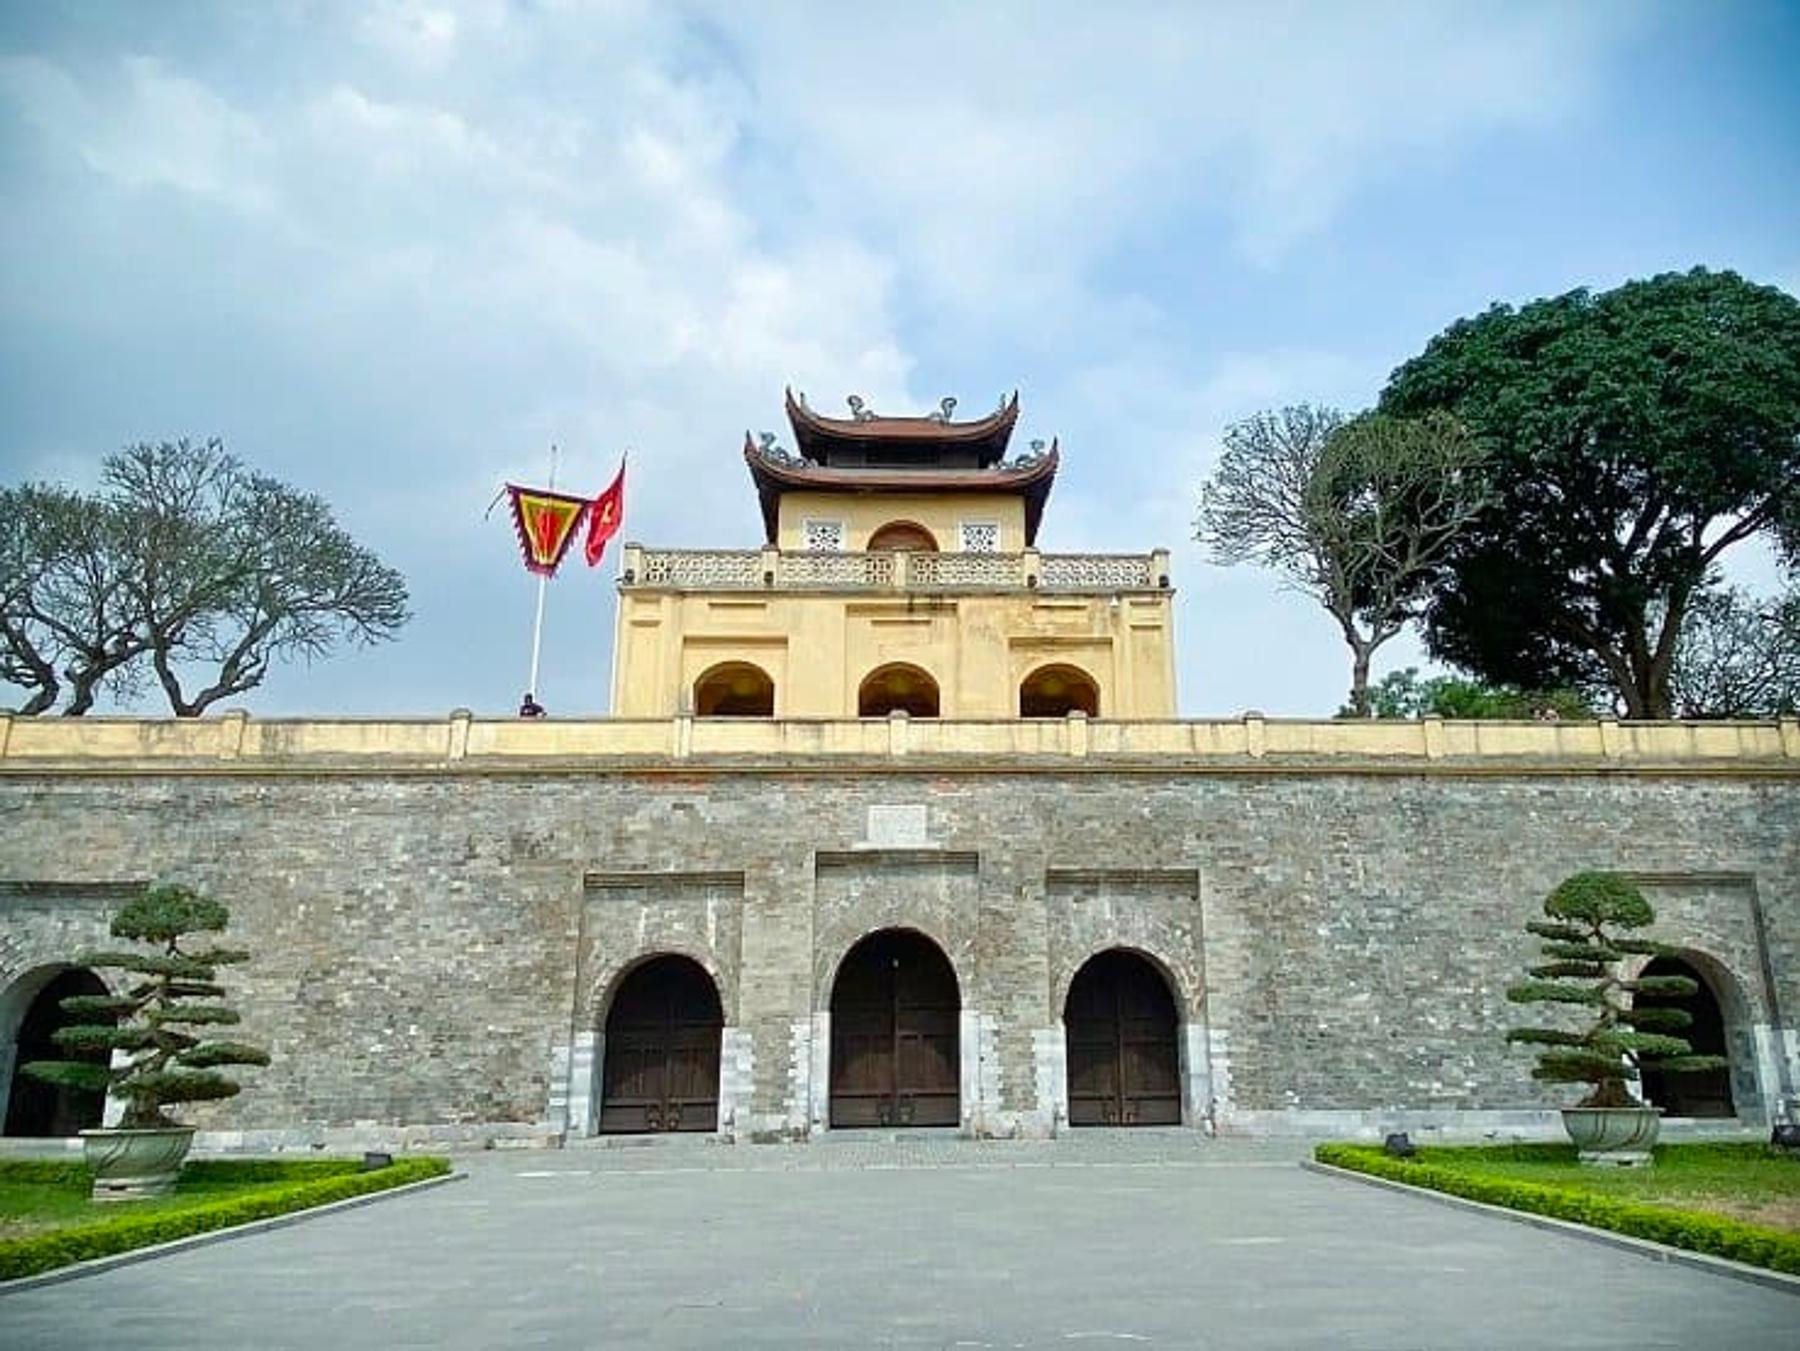 Thang Long Citadel in Hanoi, Vietnam (March 2020)